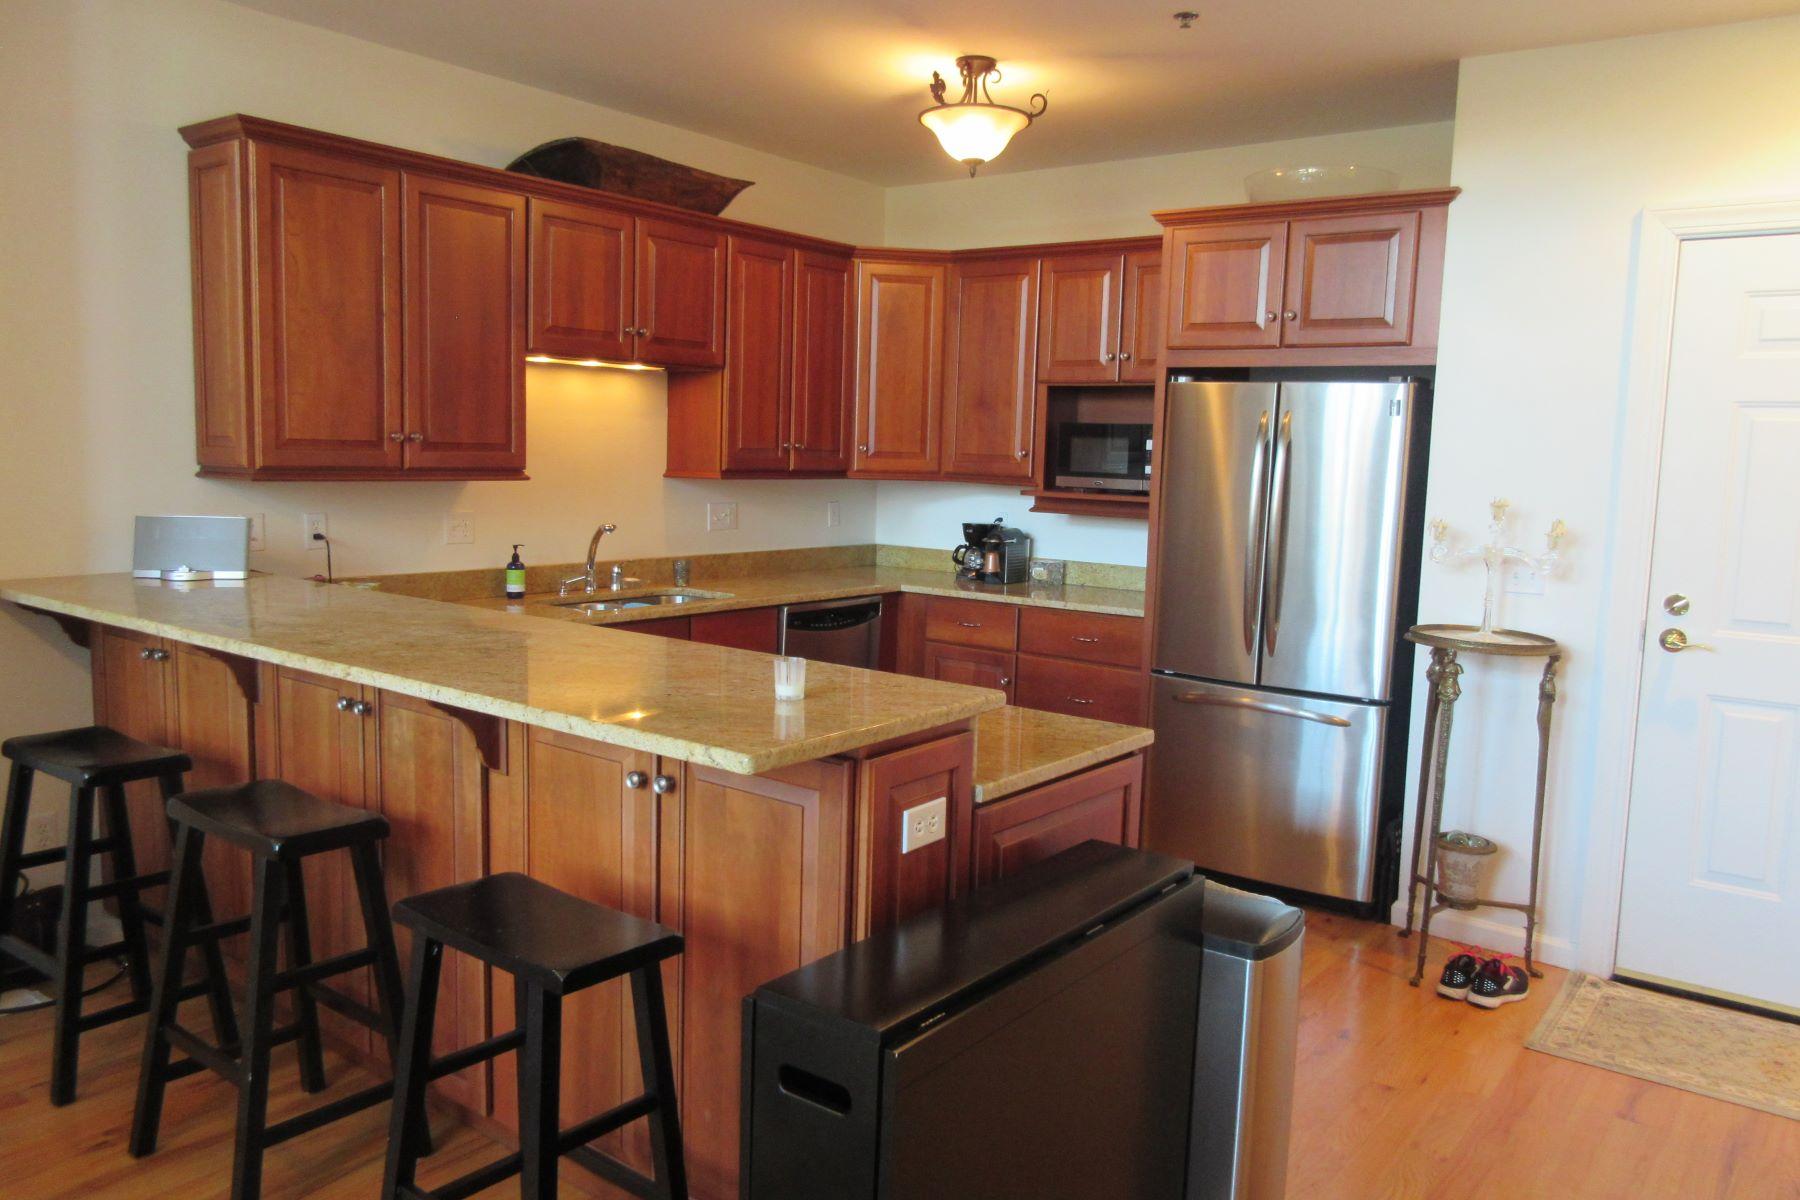 Condominiums για την Πώληση στο 1 Indian Neck Avenue 6, Branford, Κονεκτικατ 06405 Ηνωμένες Πολιτείες